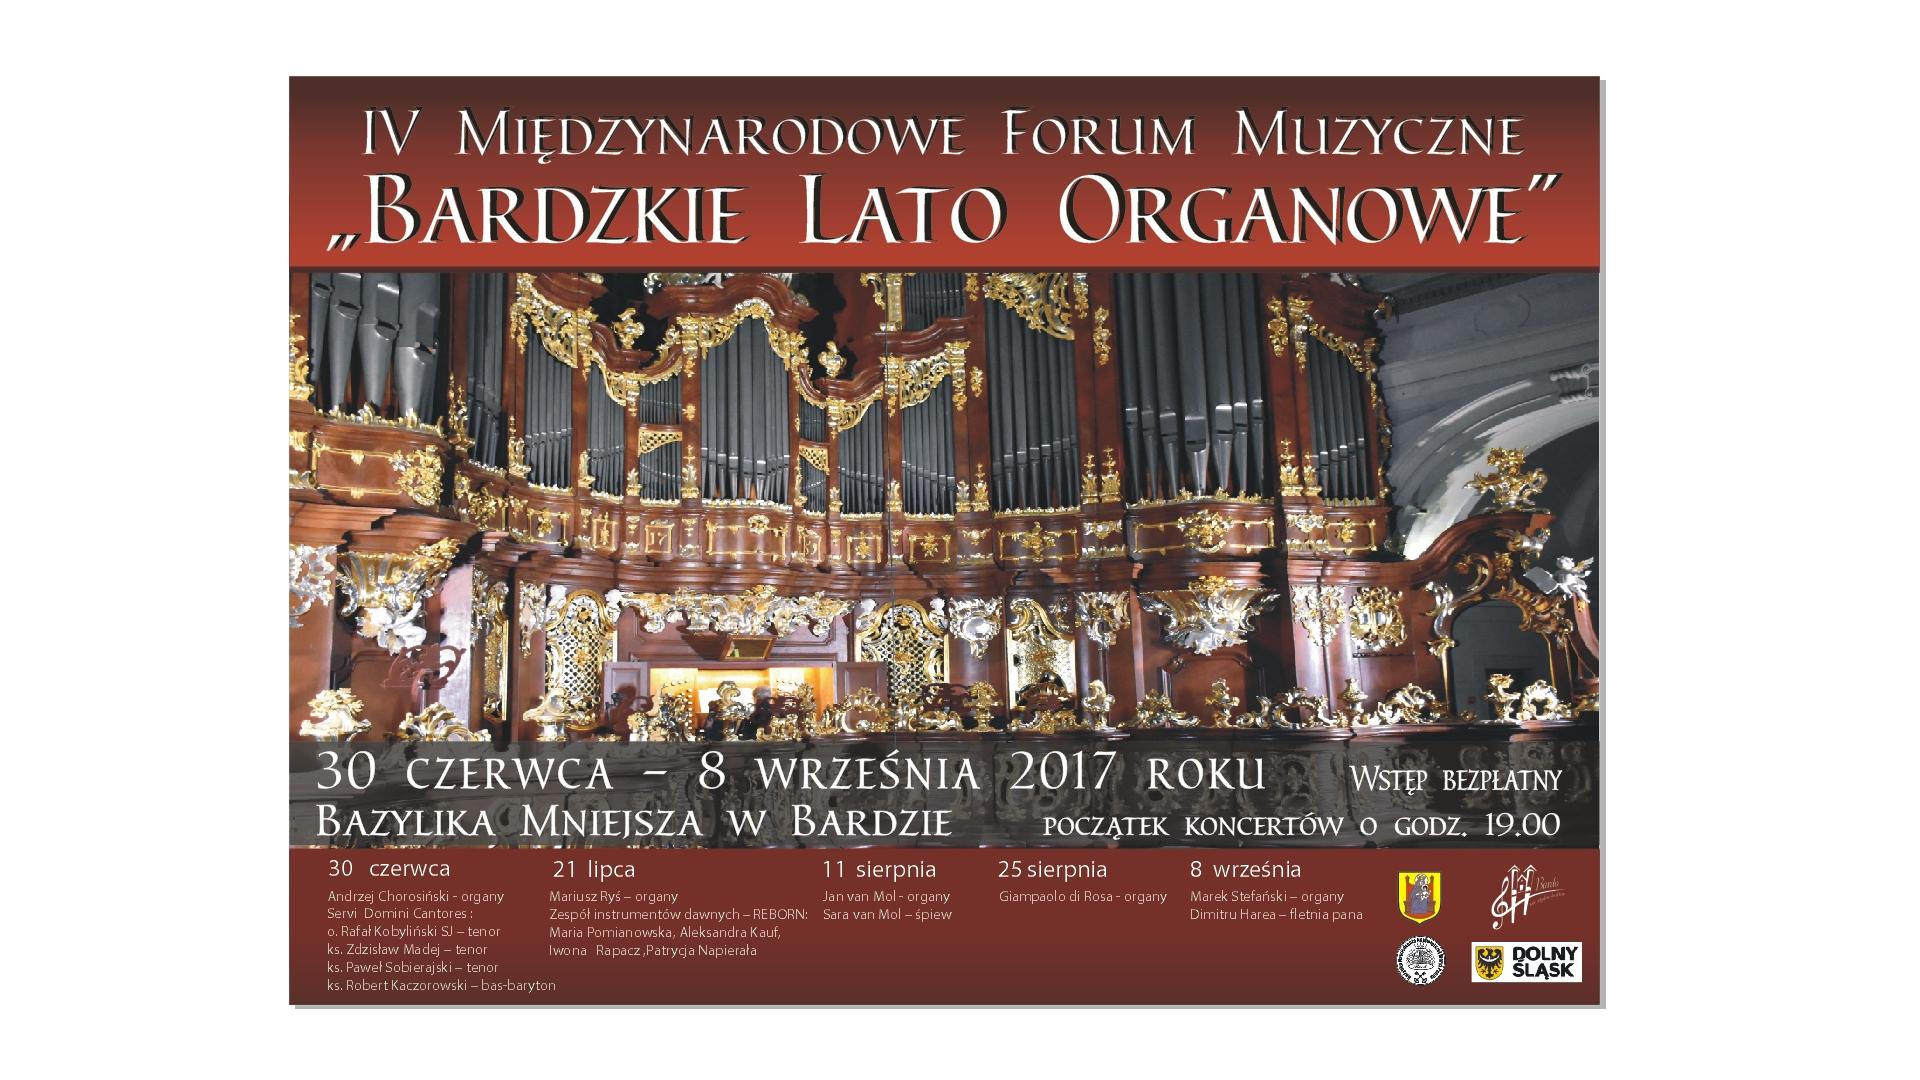 plakat lato organowe 2017